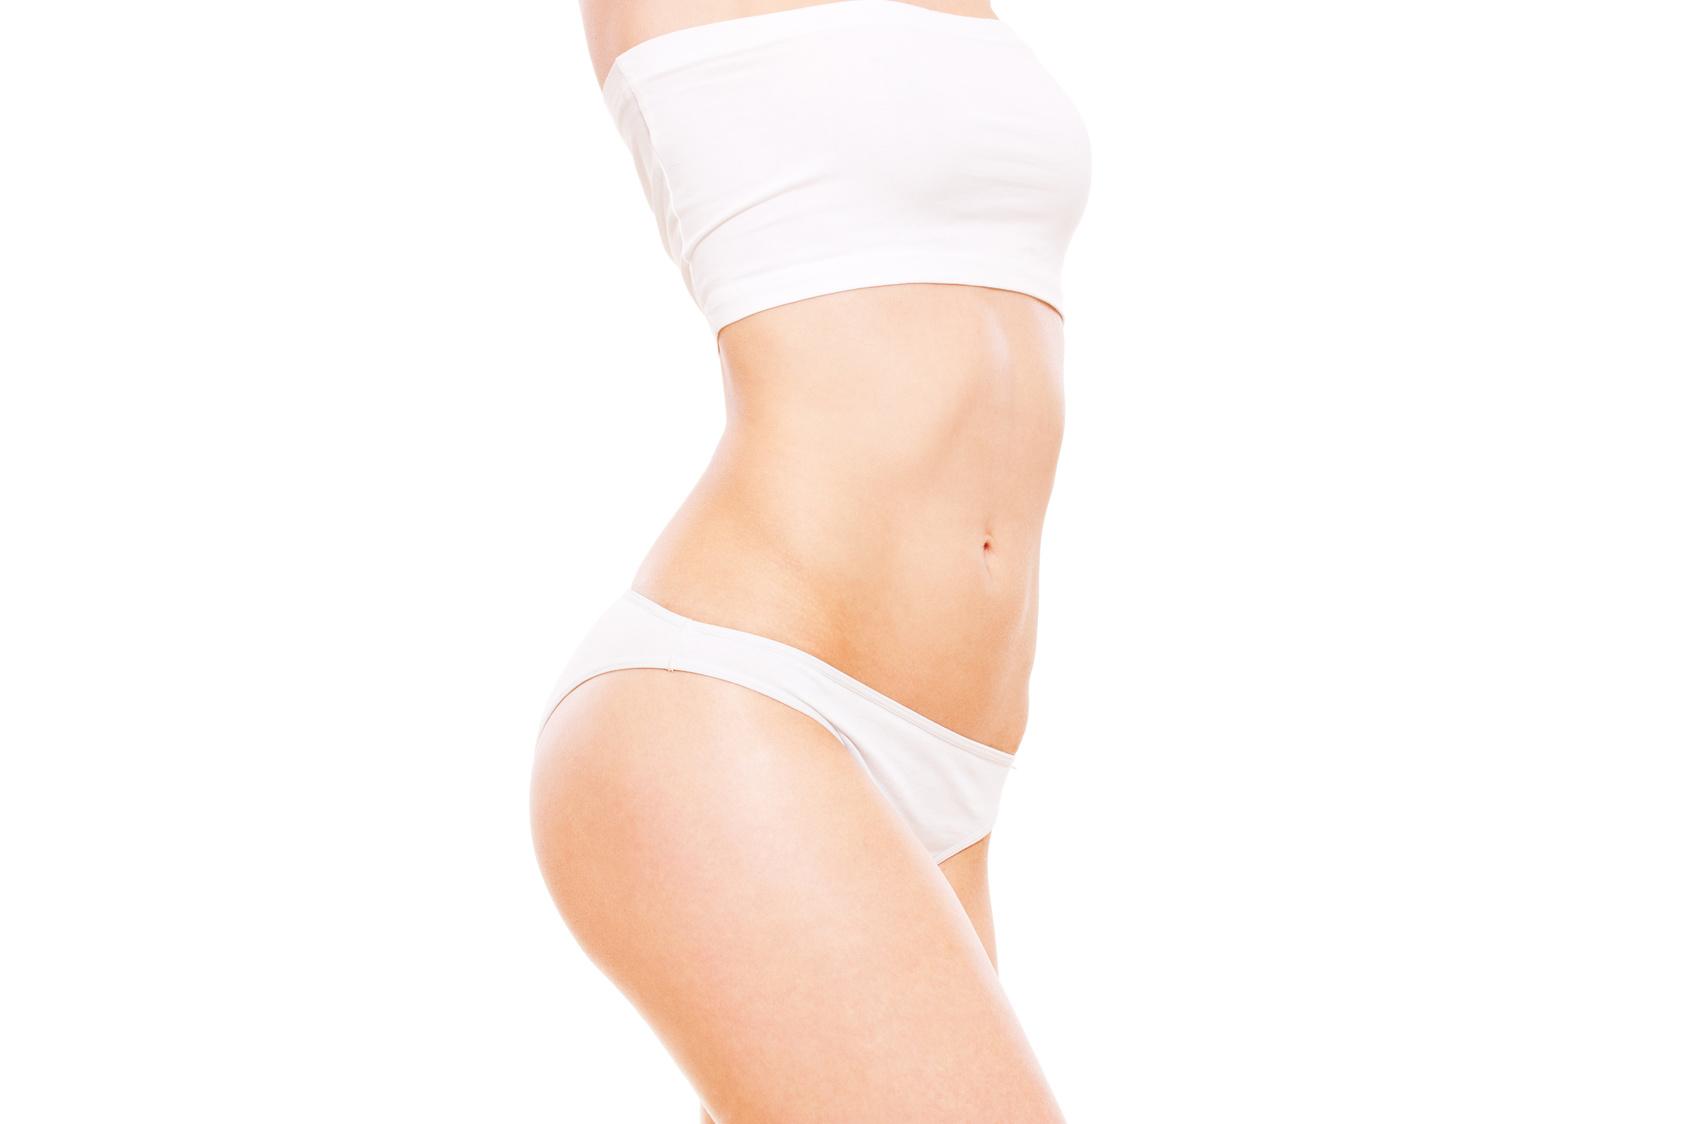 healthy woman's body